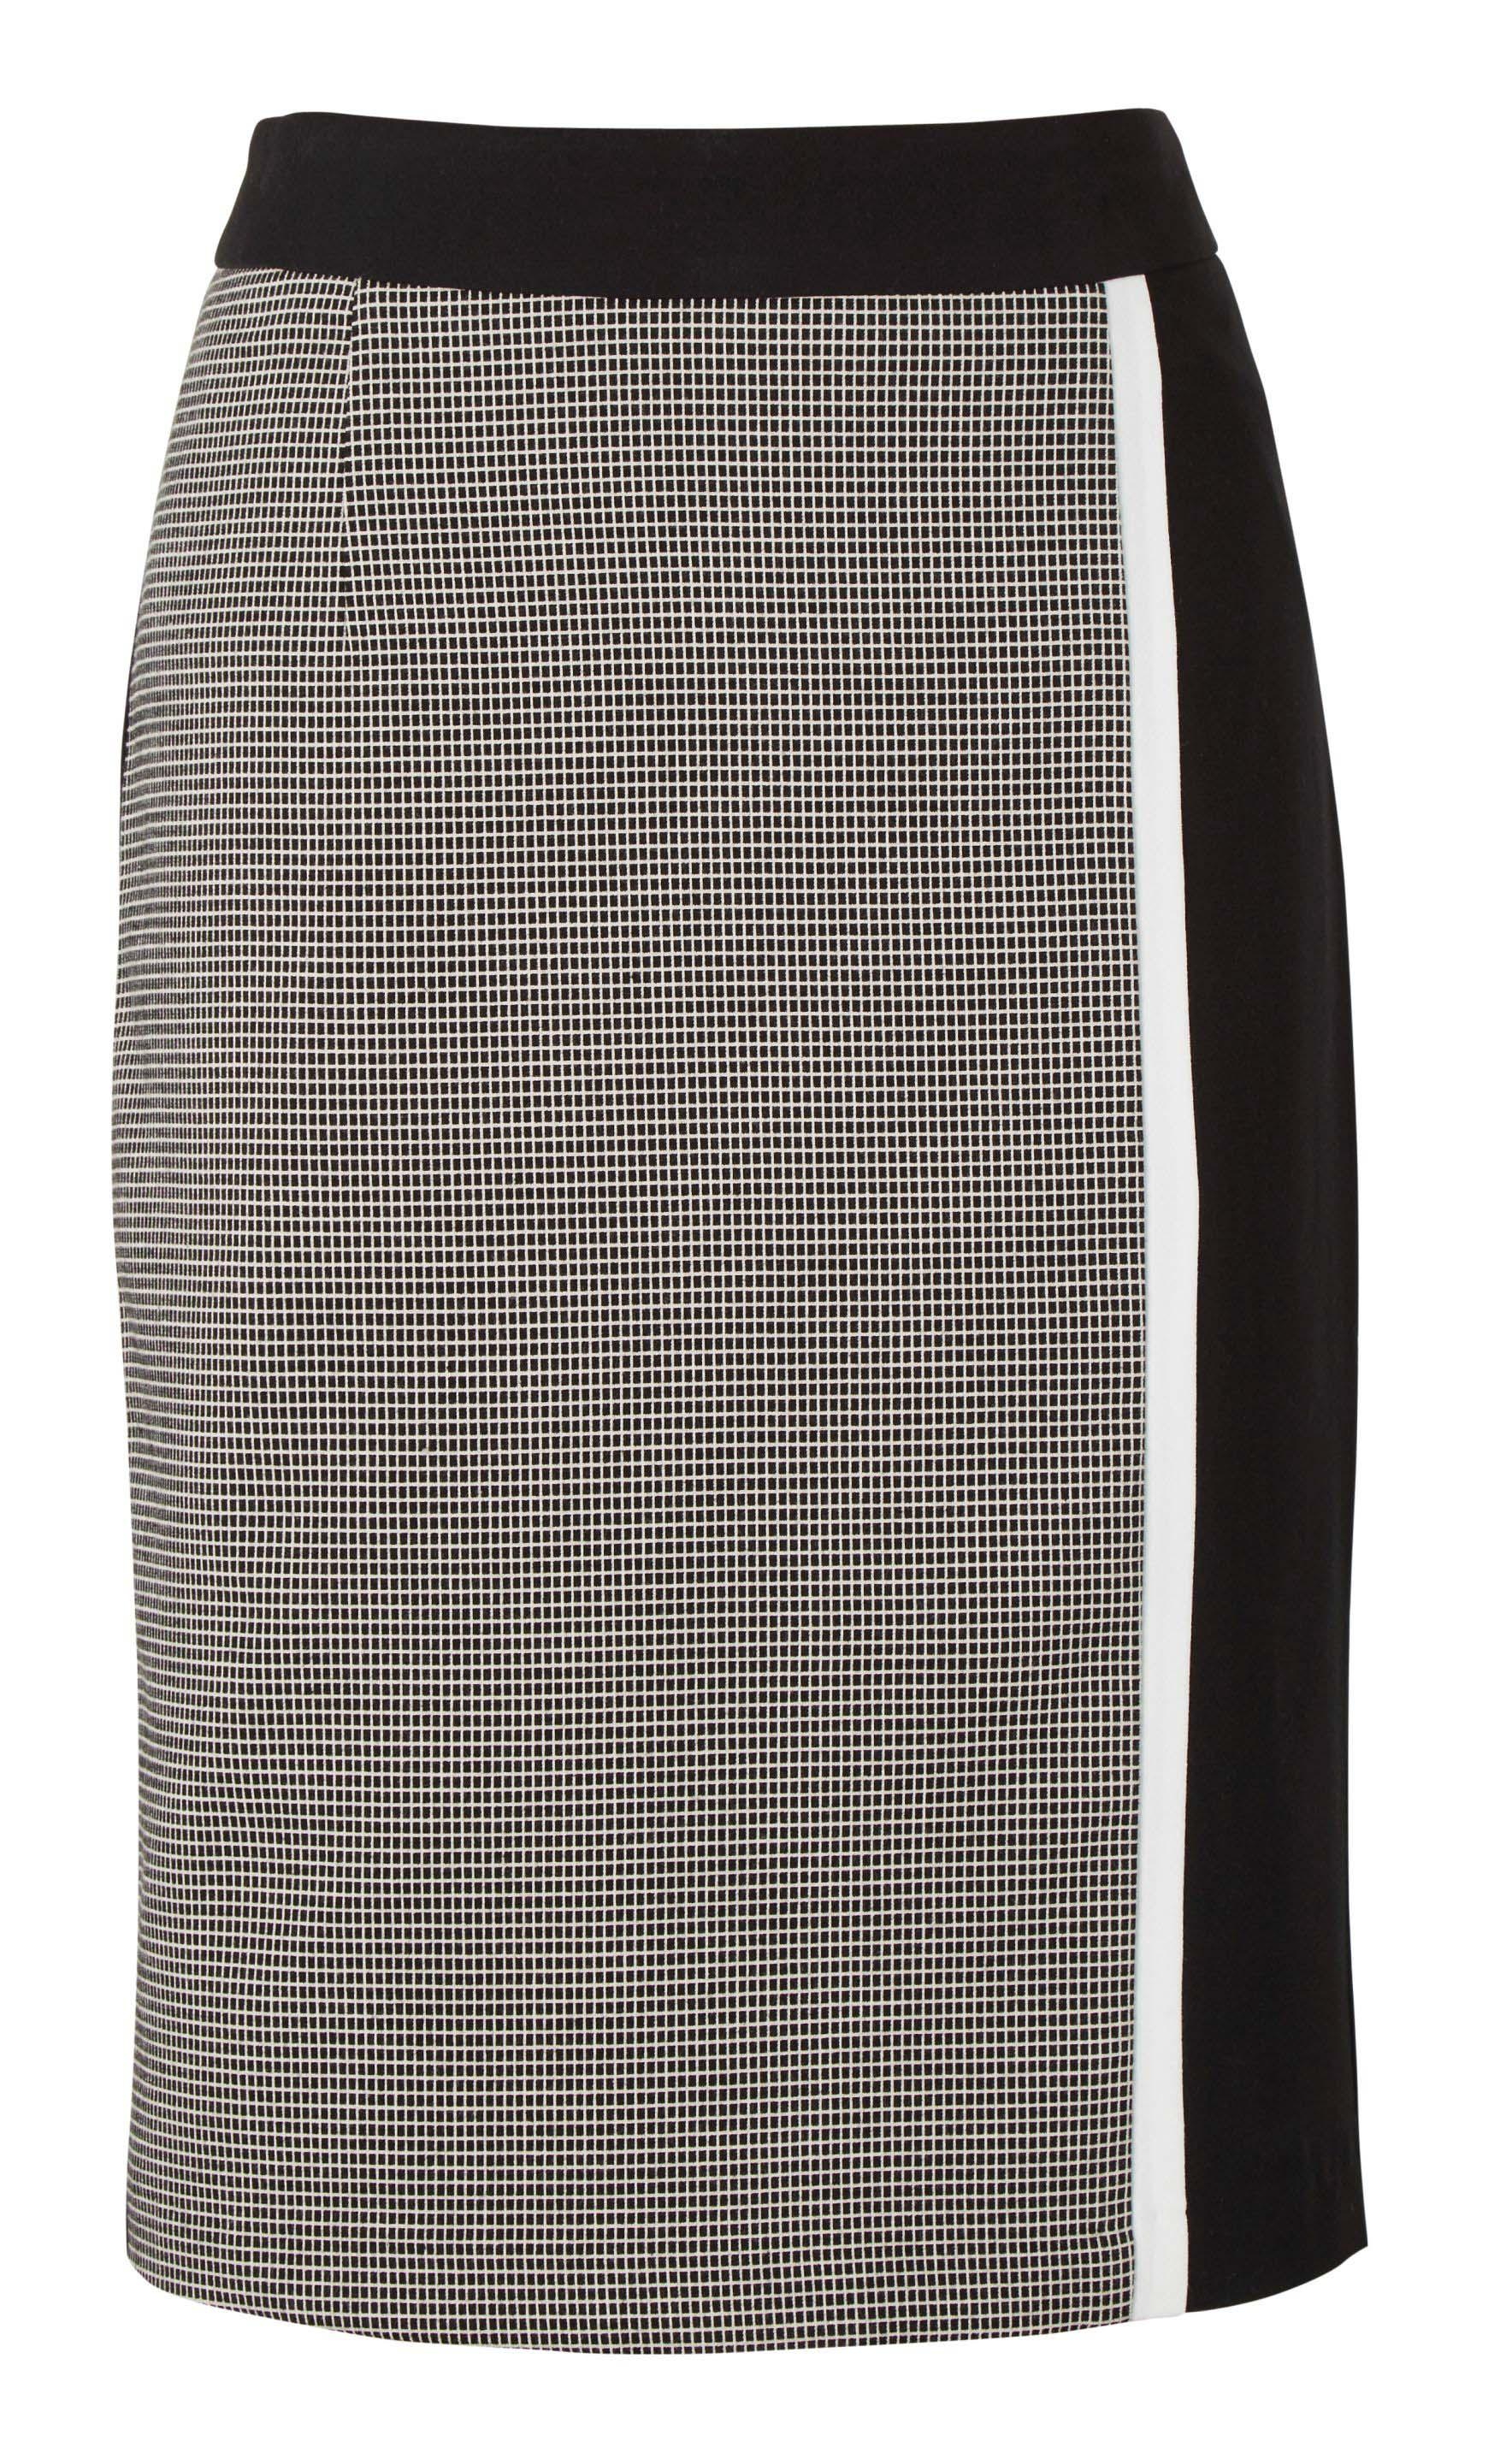 6089618 Oliver Black Colour BlockSkirt $89.99 Instore March 08 2016